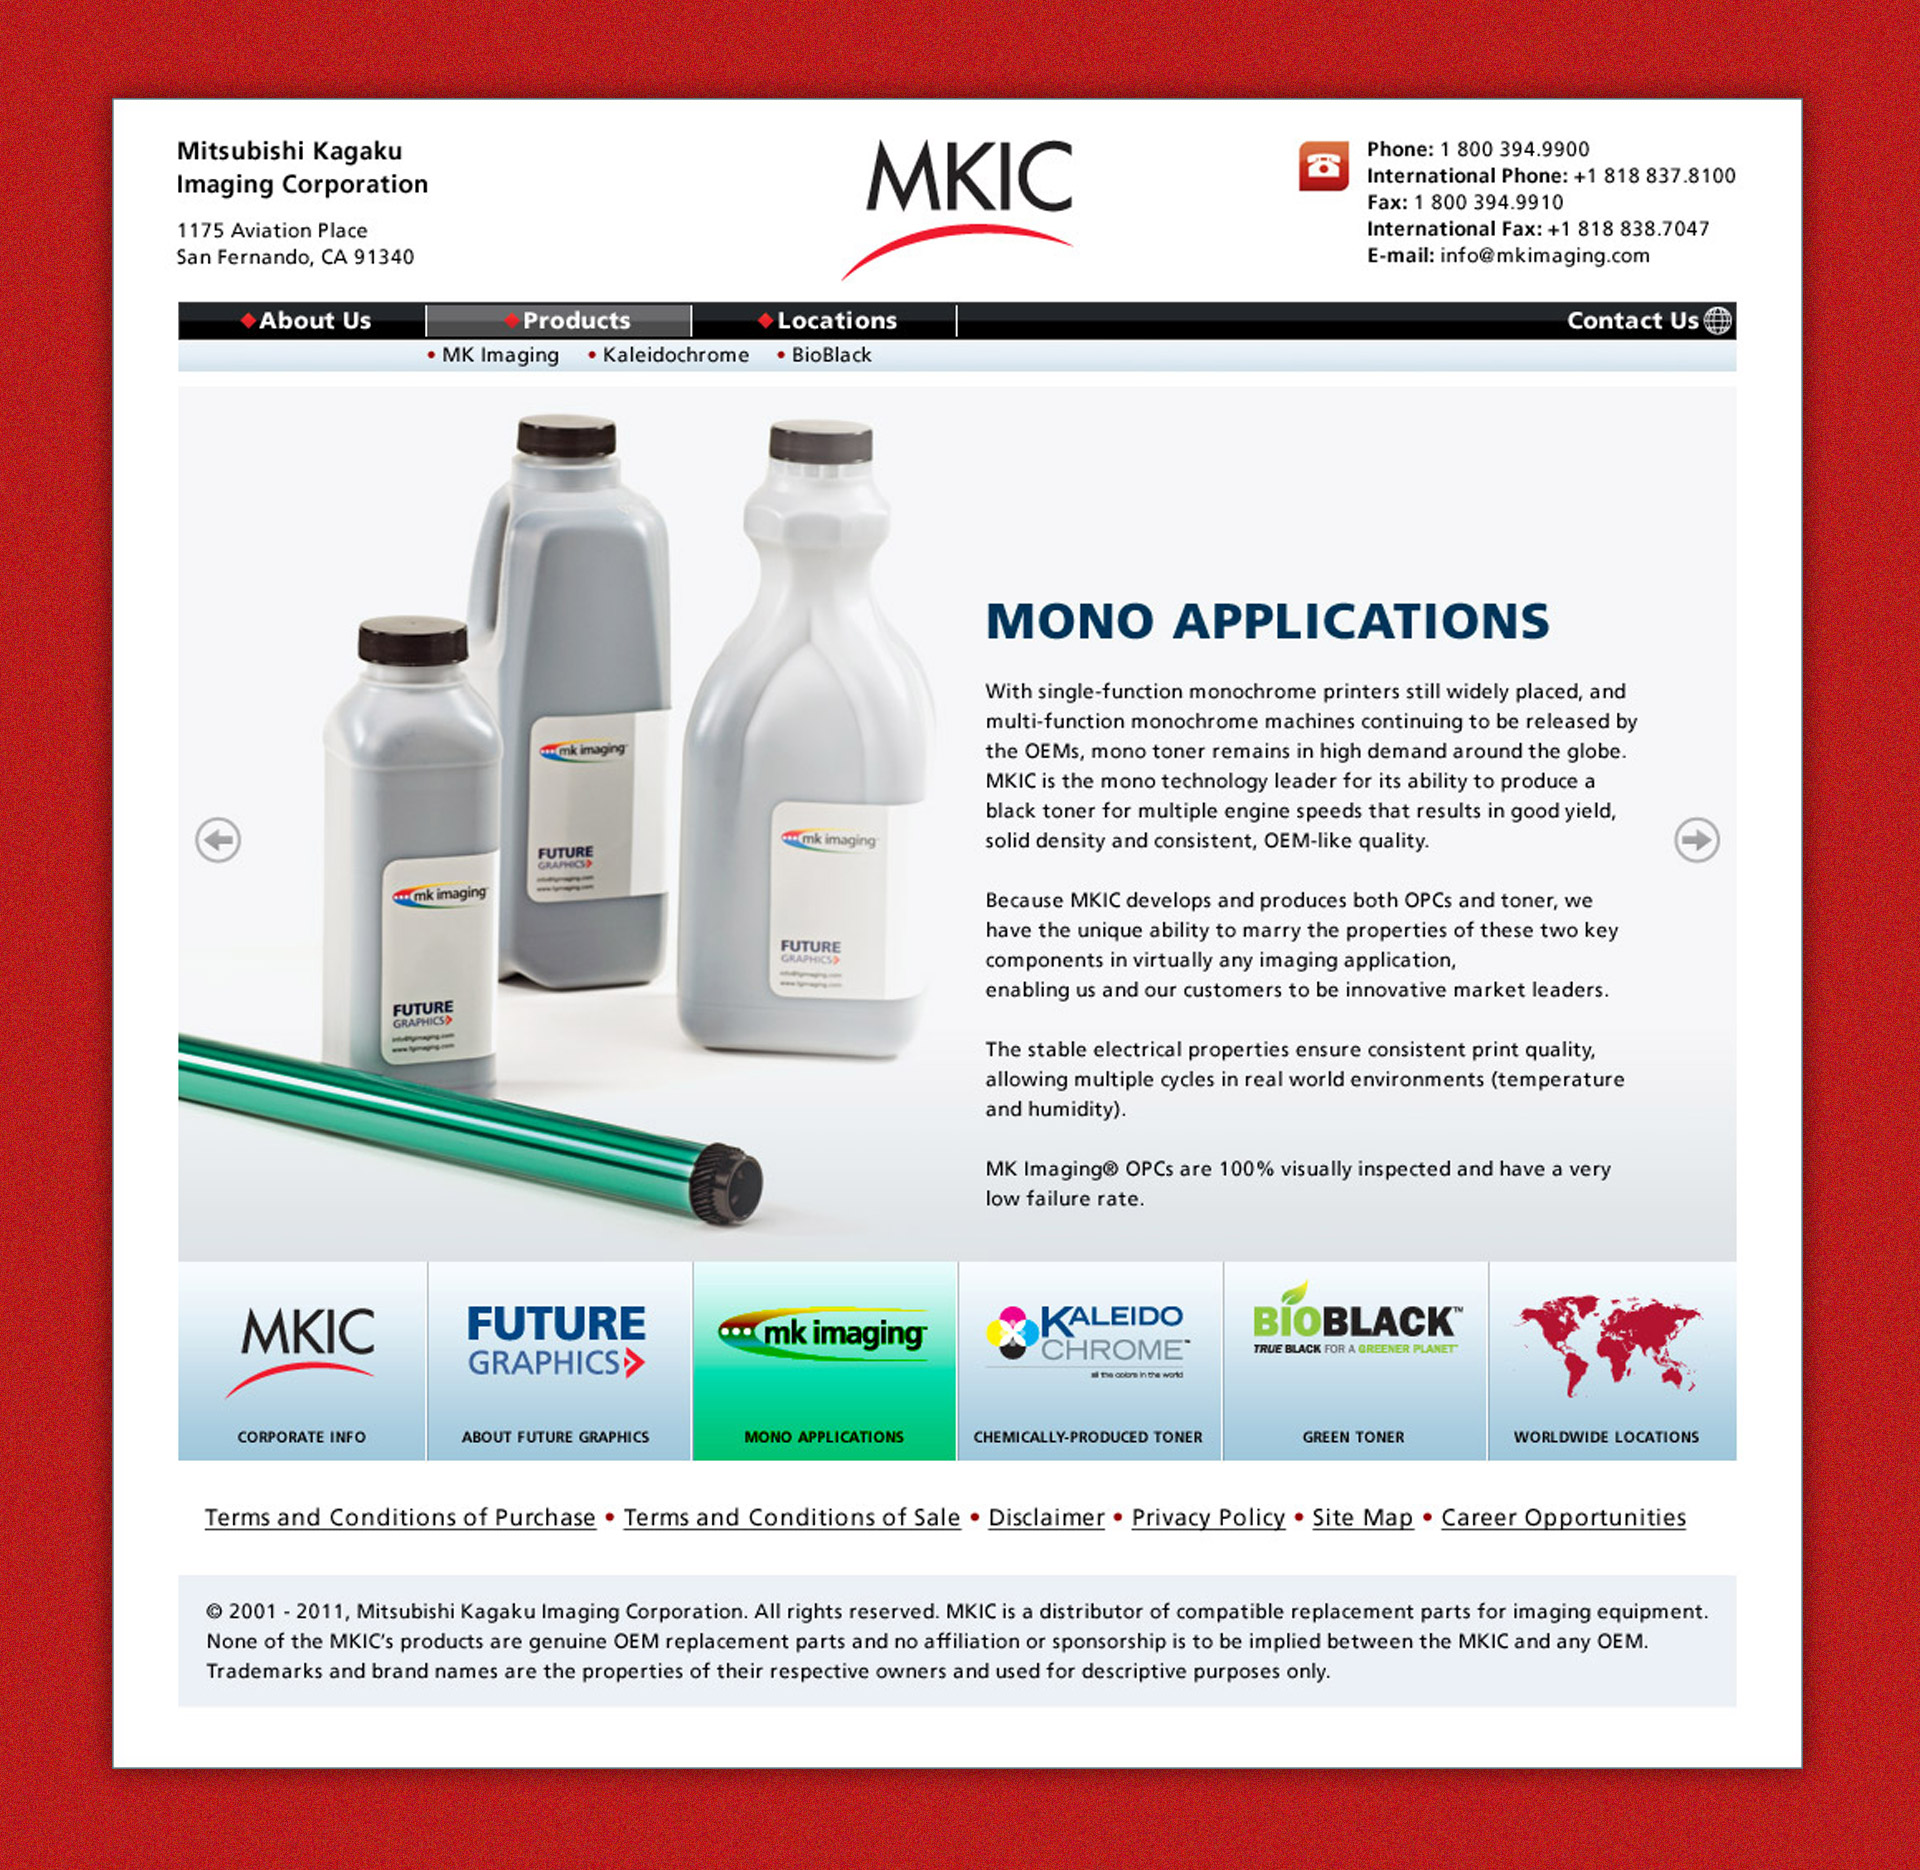 mkic_website4.jpg